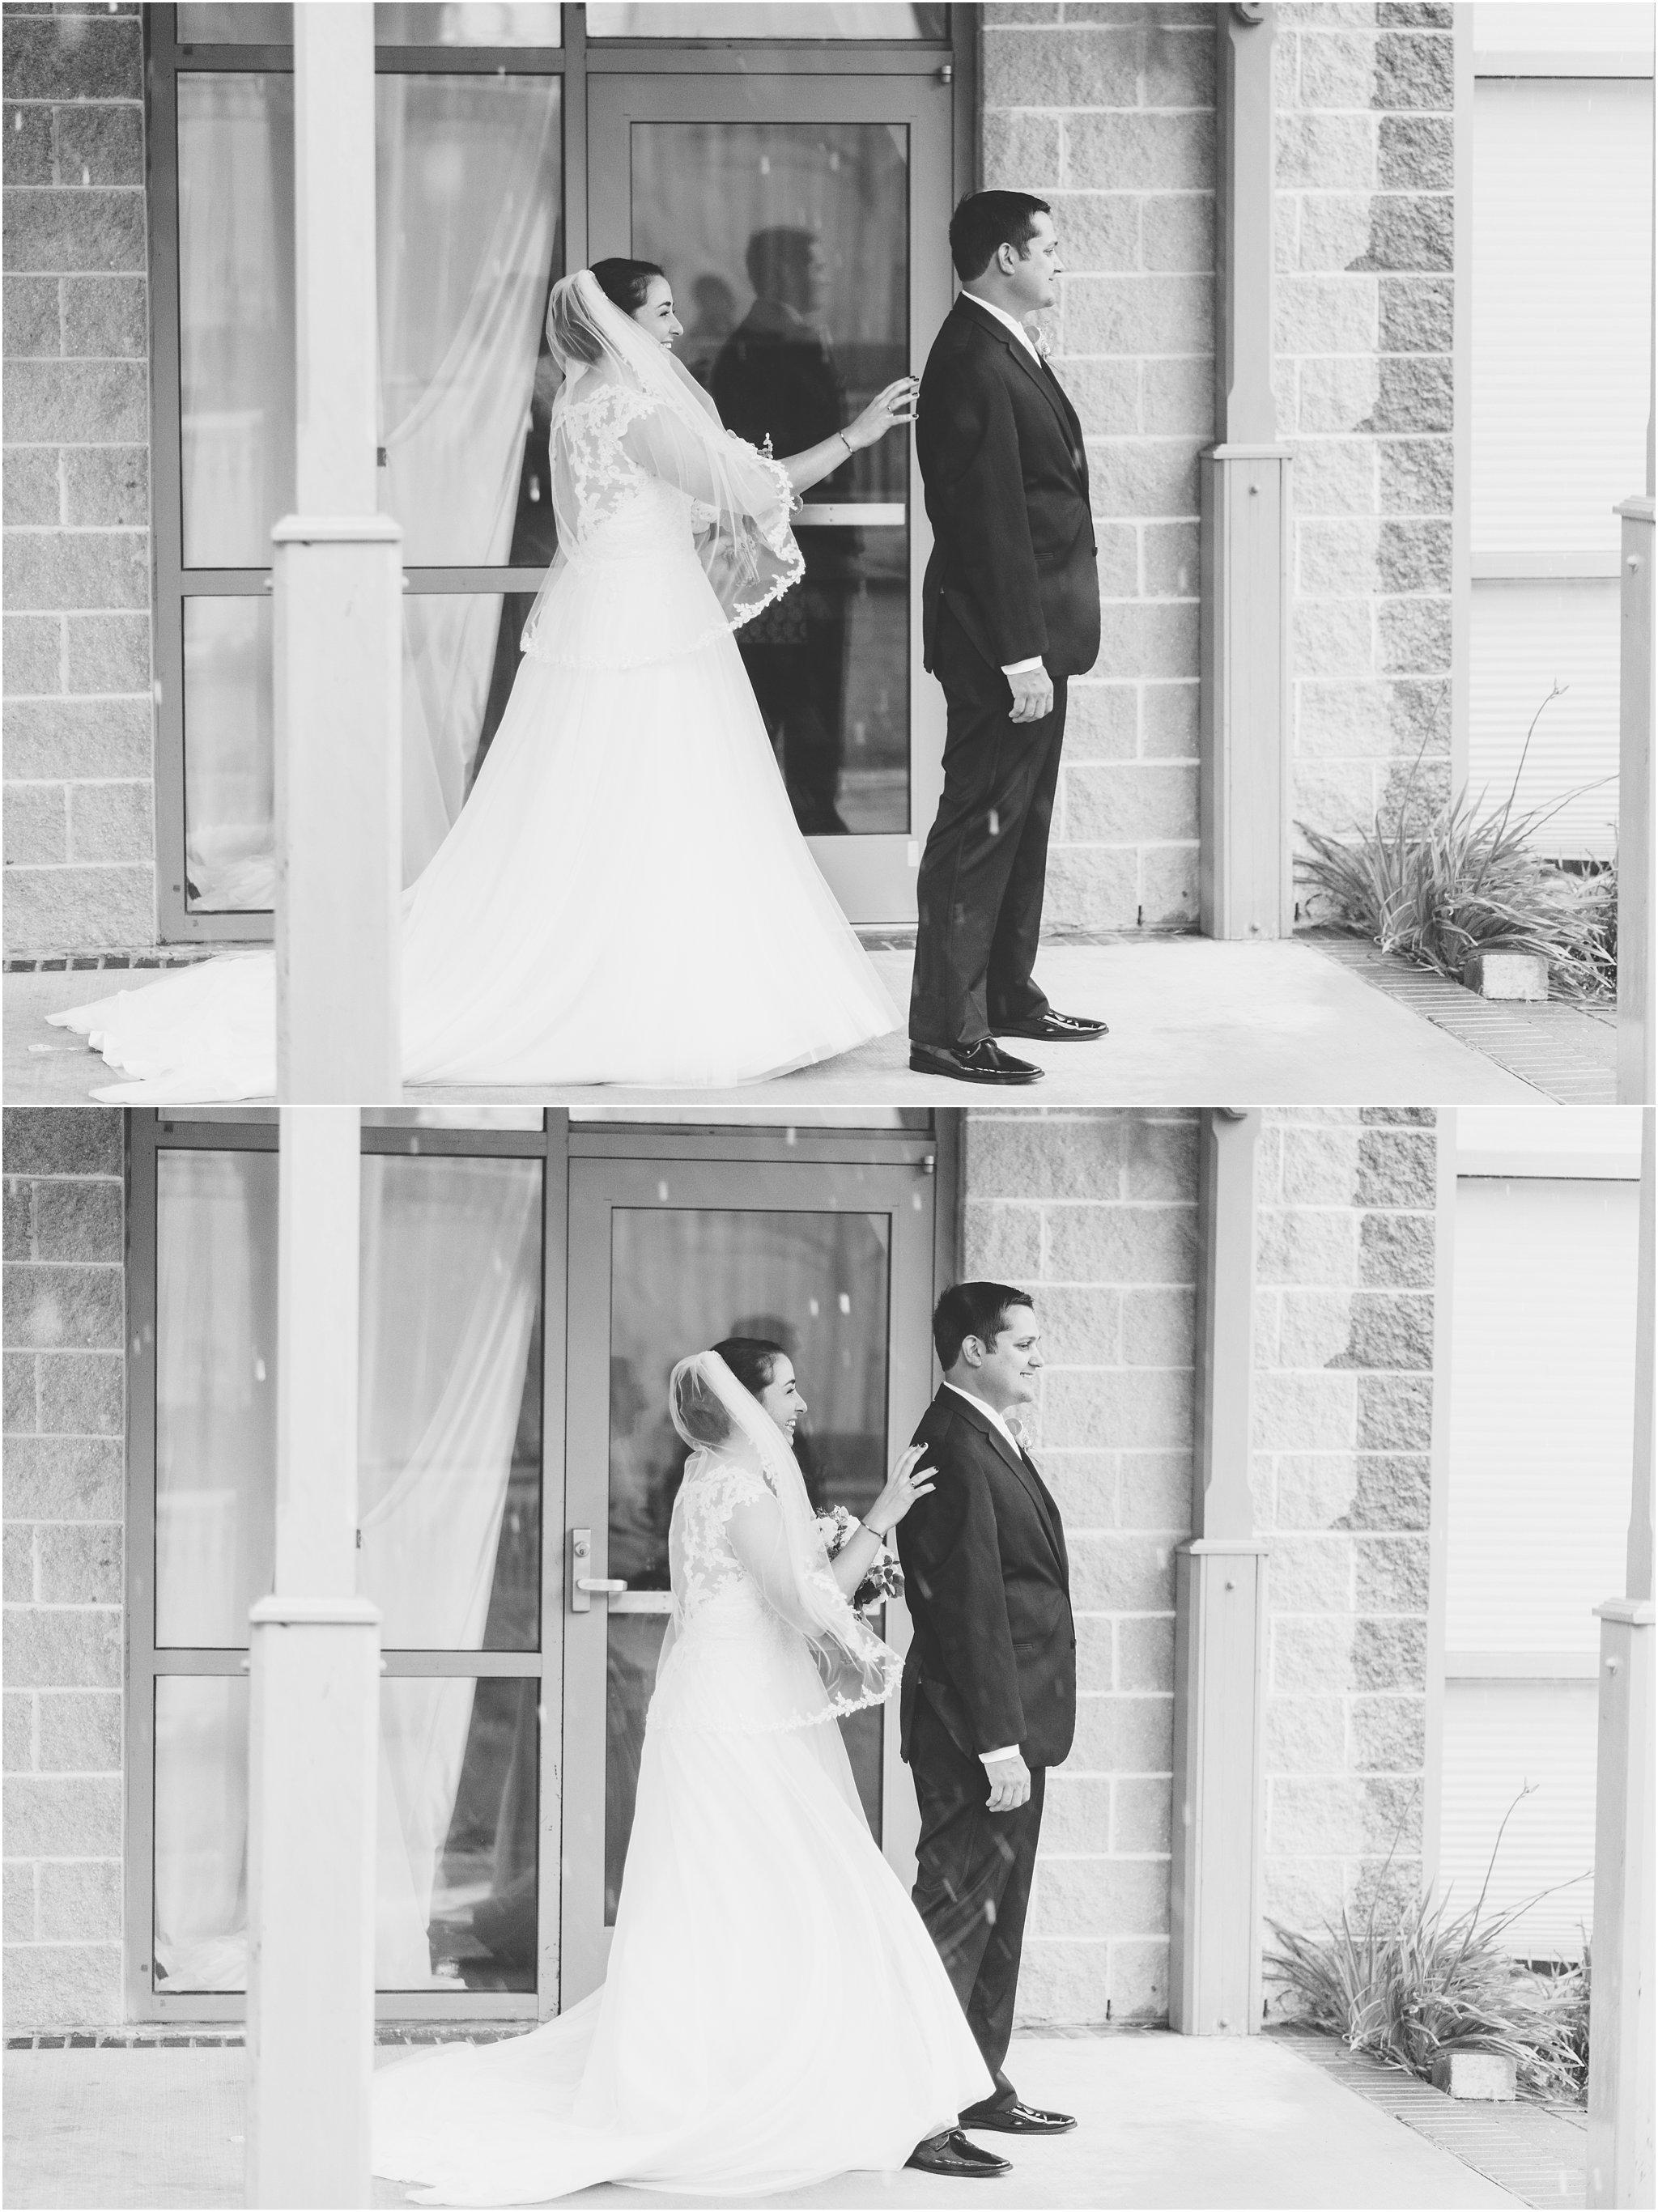 jessica_ryan_photography_virginia_wedding_photographer_wedding_hurricane_norfolk_botanical_gardens_hurricane_matthew_wedding_3561